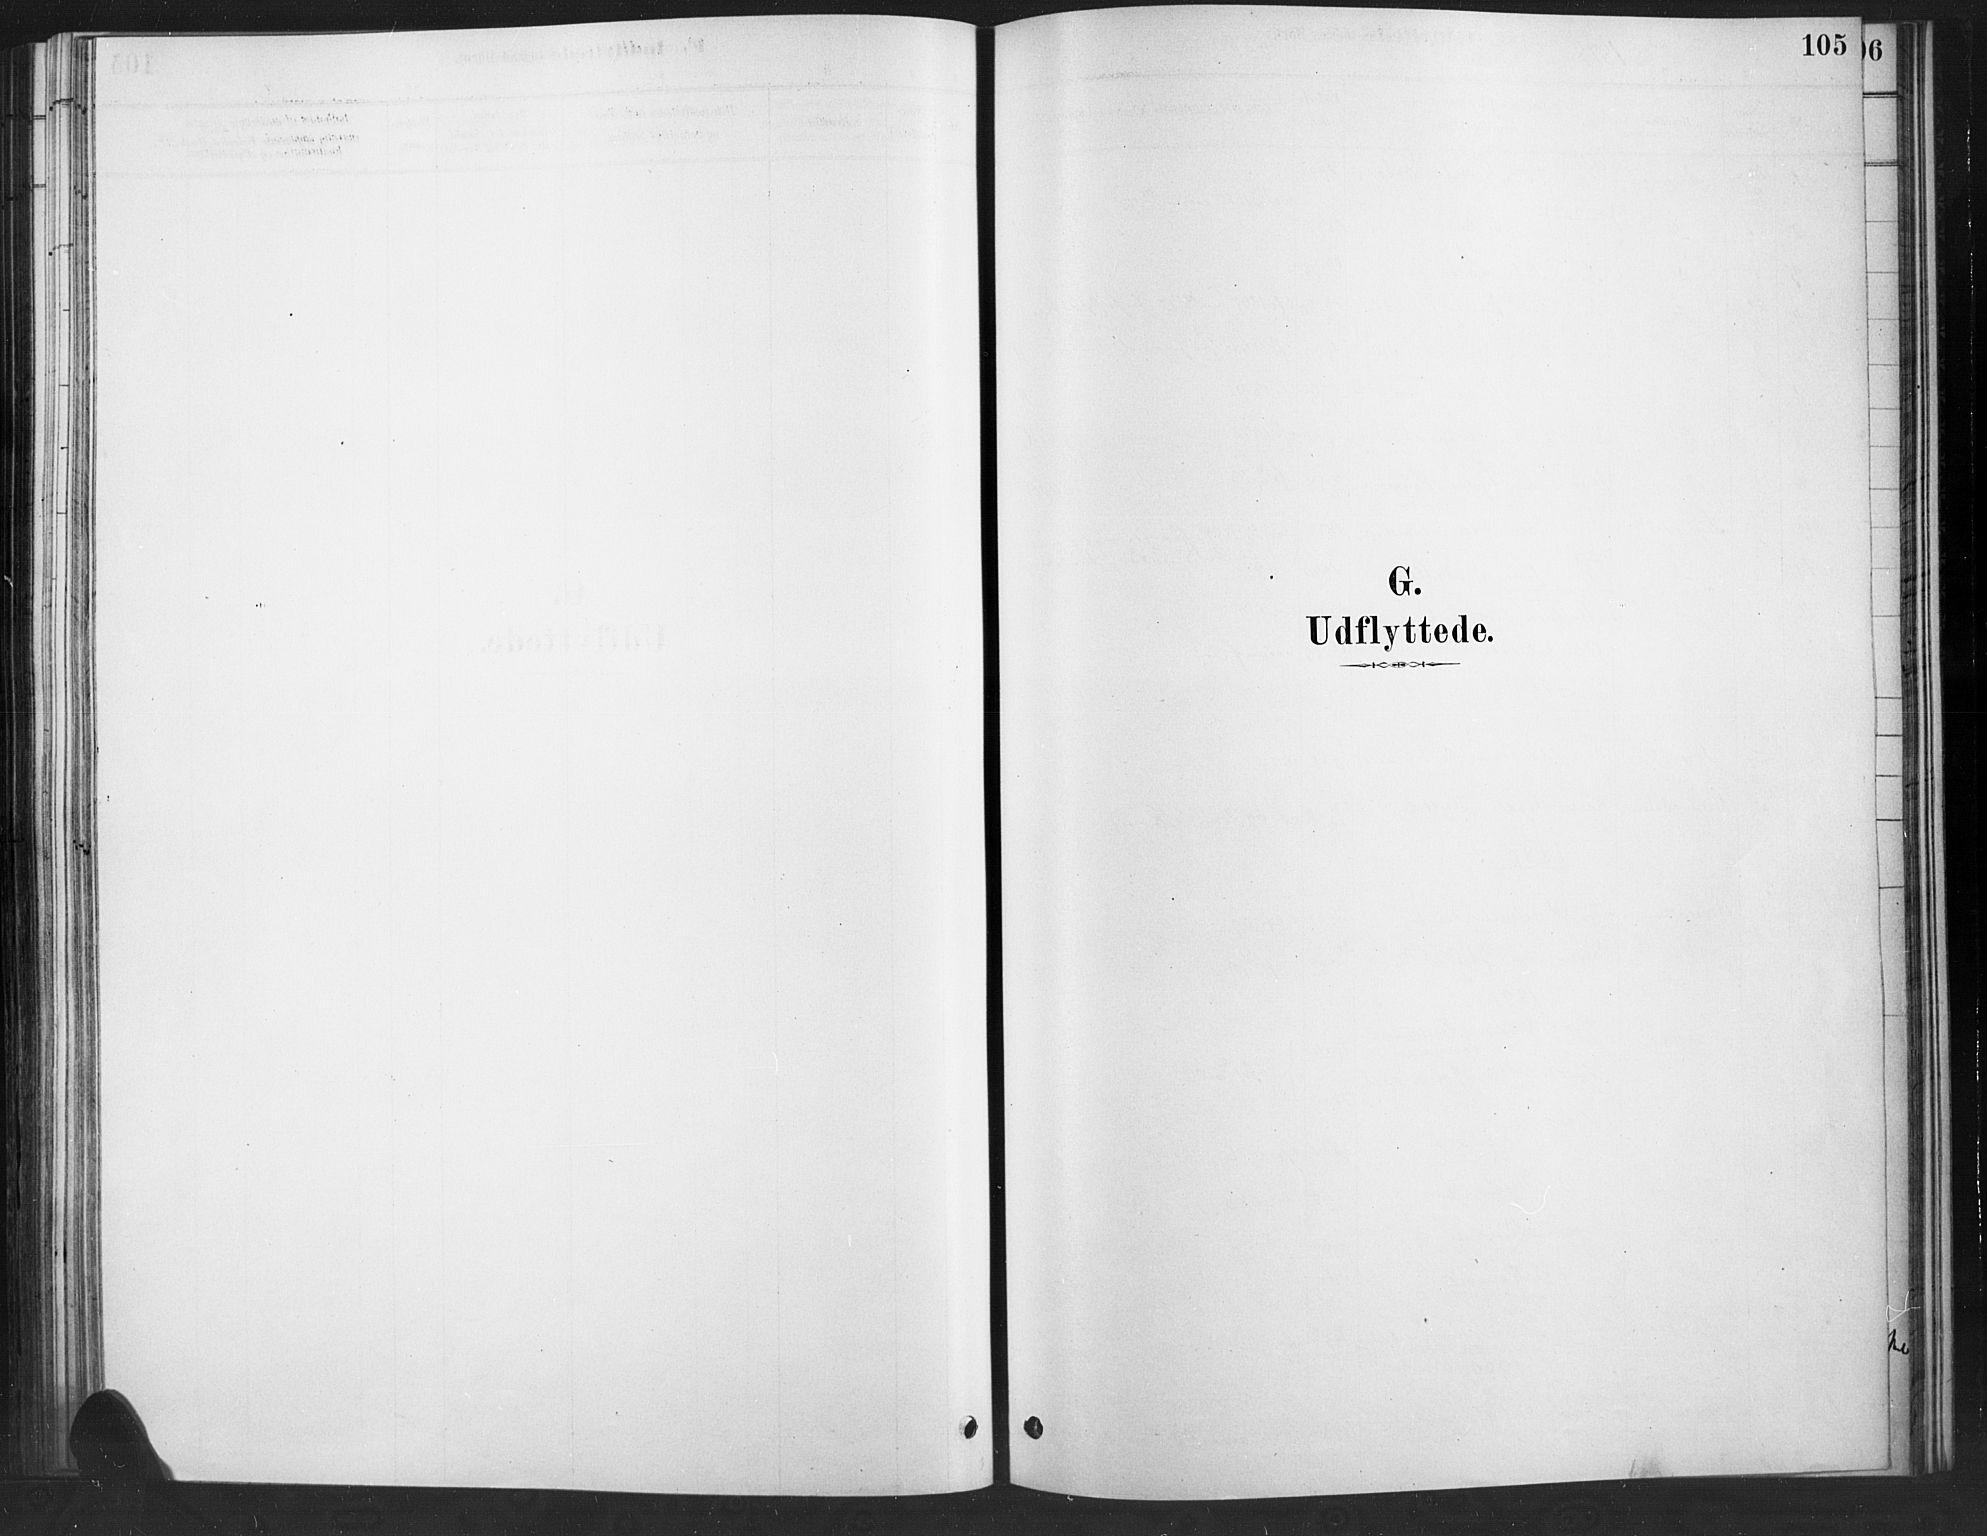 SAH, Ringebu prestekontor, Ministerialbok nr. 10, 1878-1898, s. 105